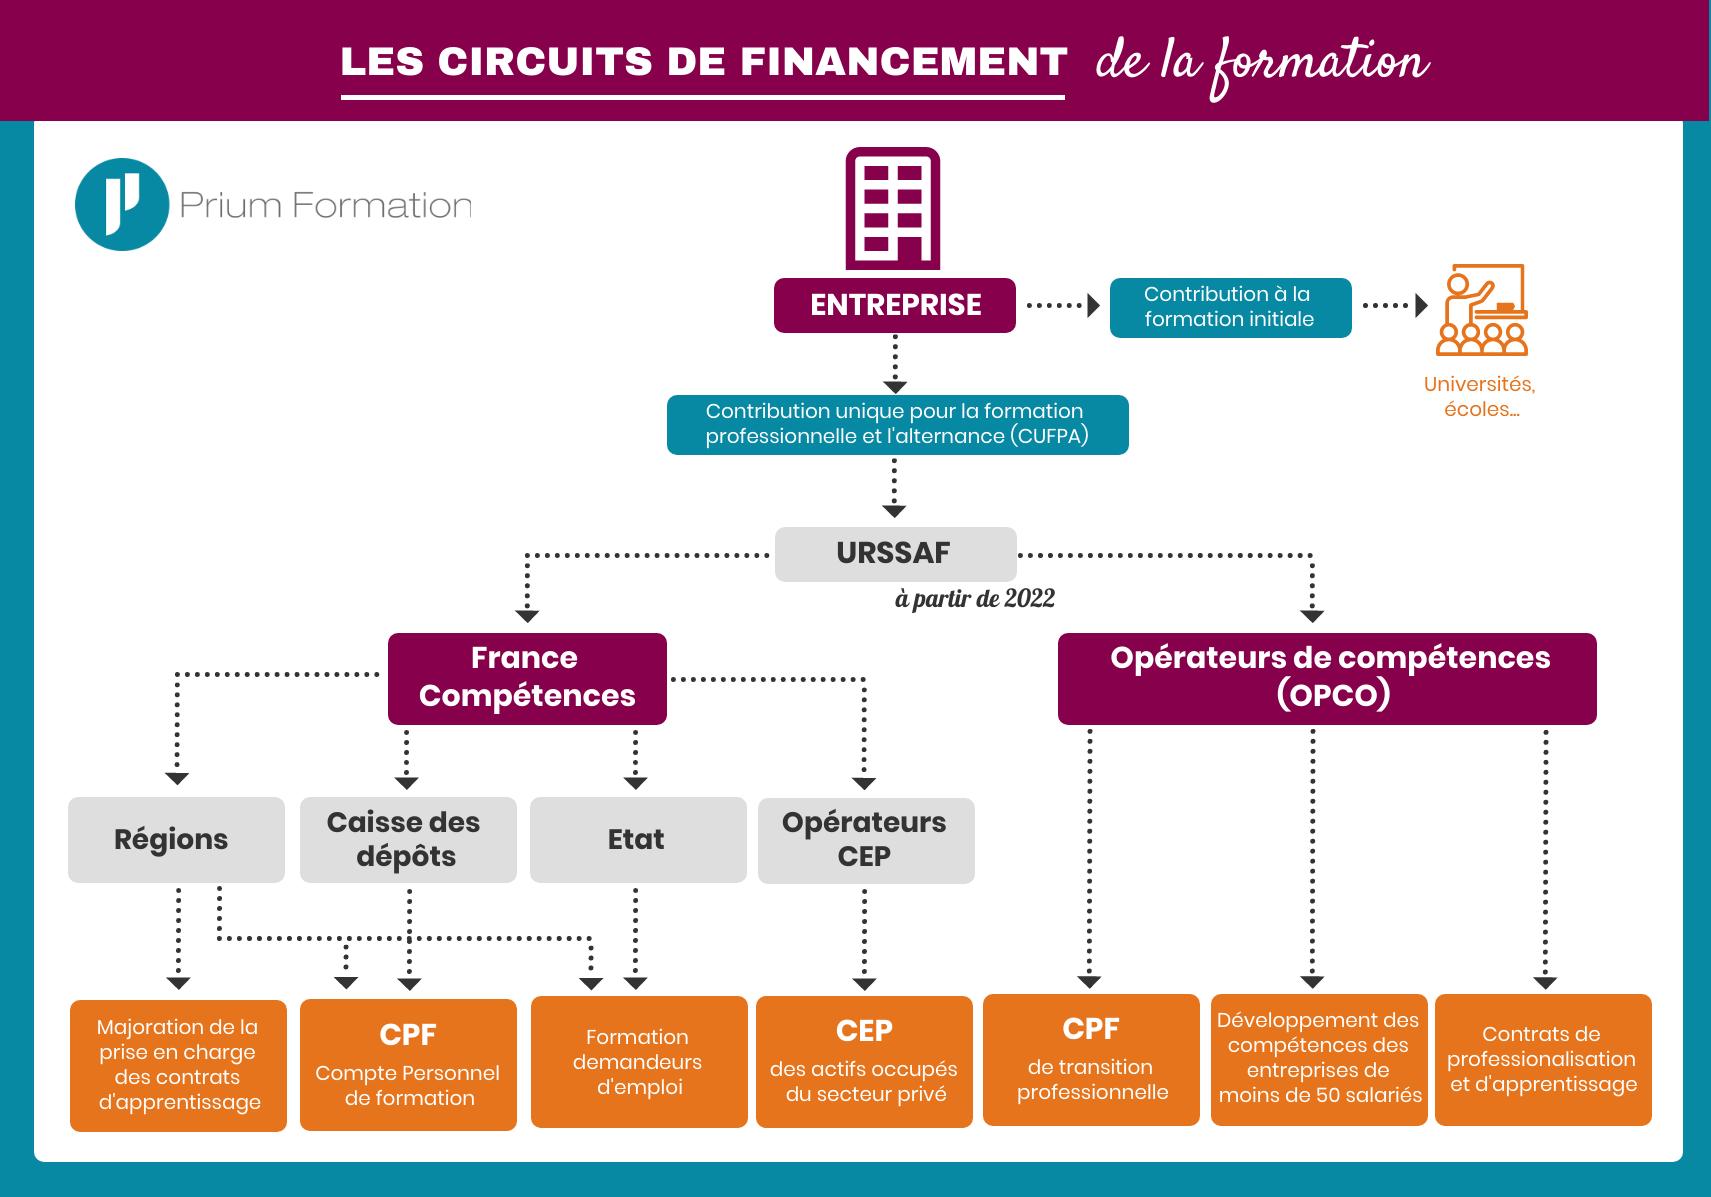 Les circuits de financement de la formation